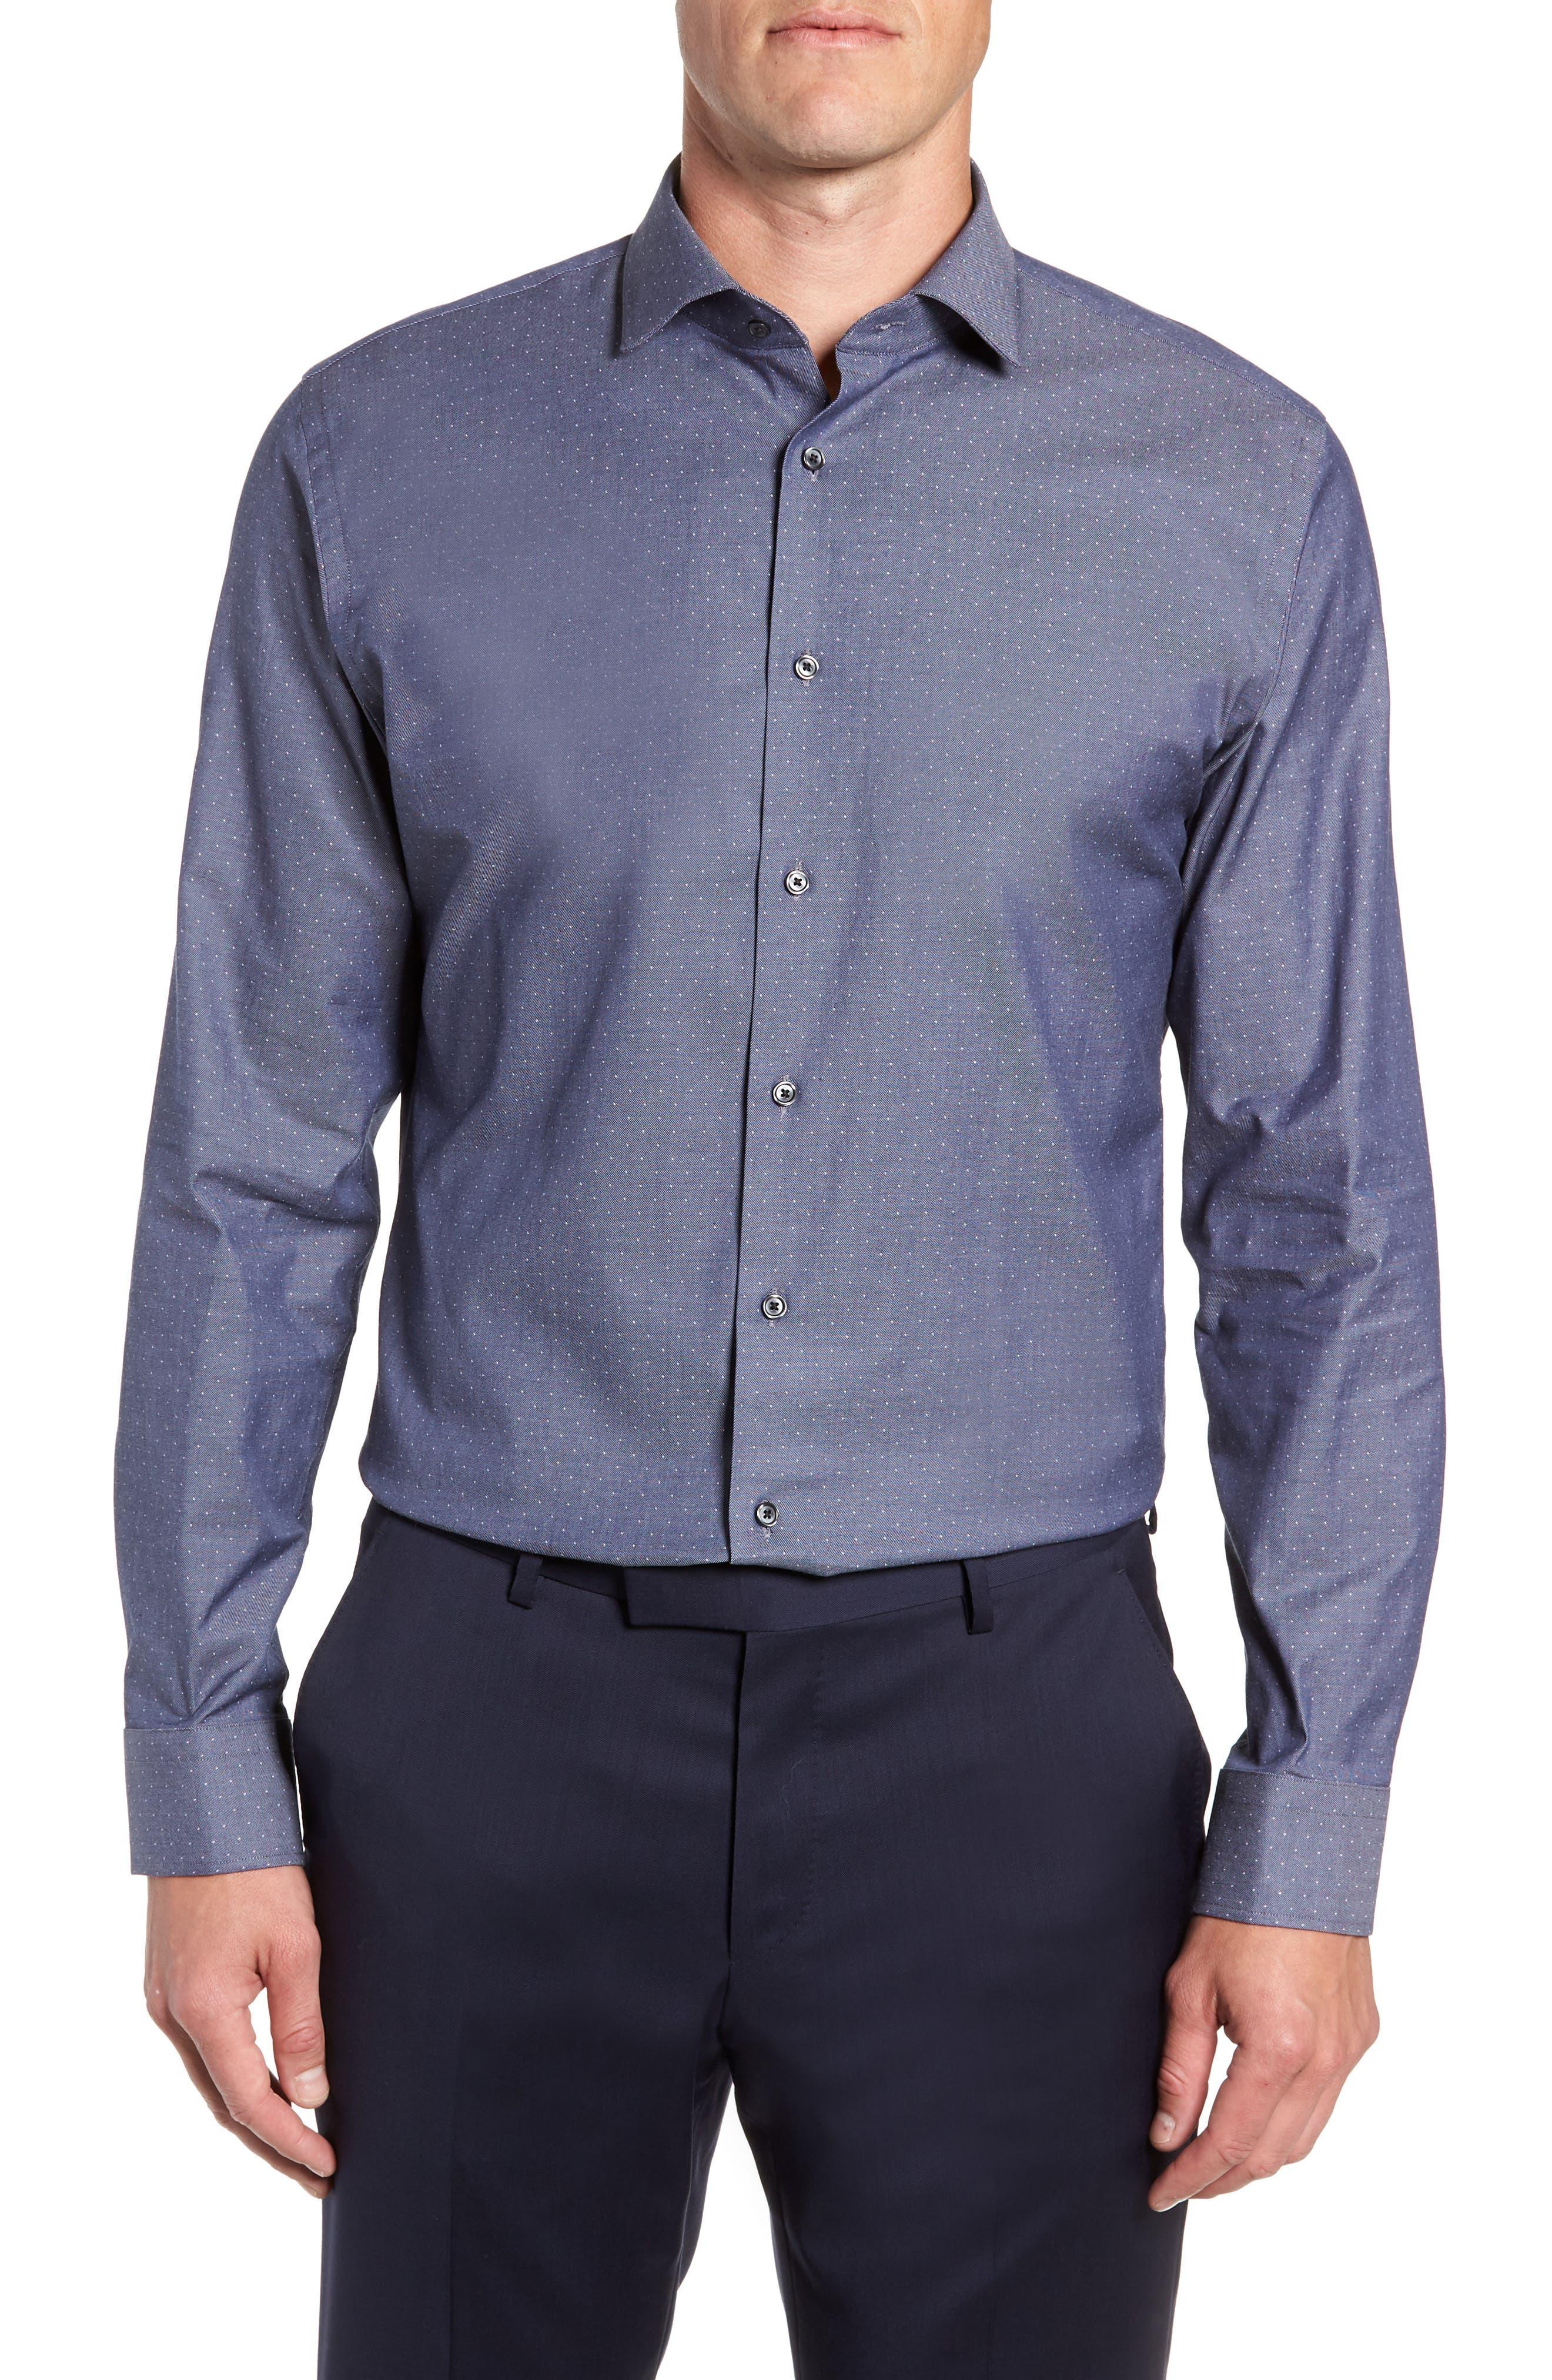 CALIBRATE Trim Fit Stretch Dot Dress Shirt, Main, color, NAVY PEACOAT